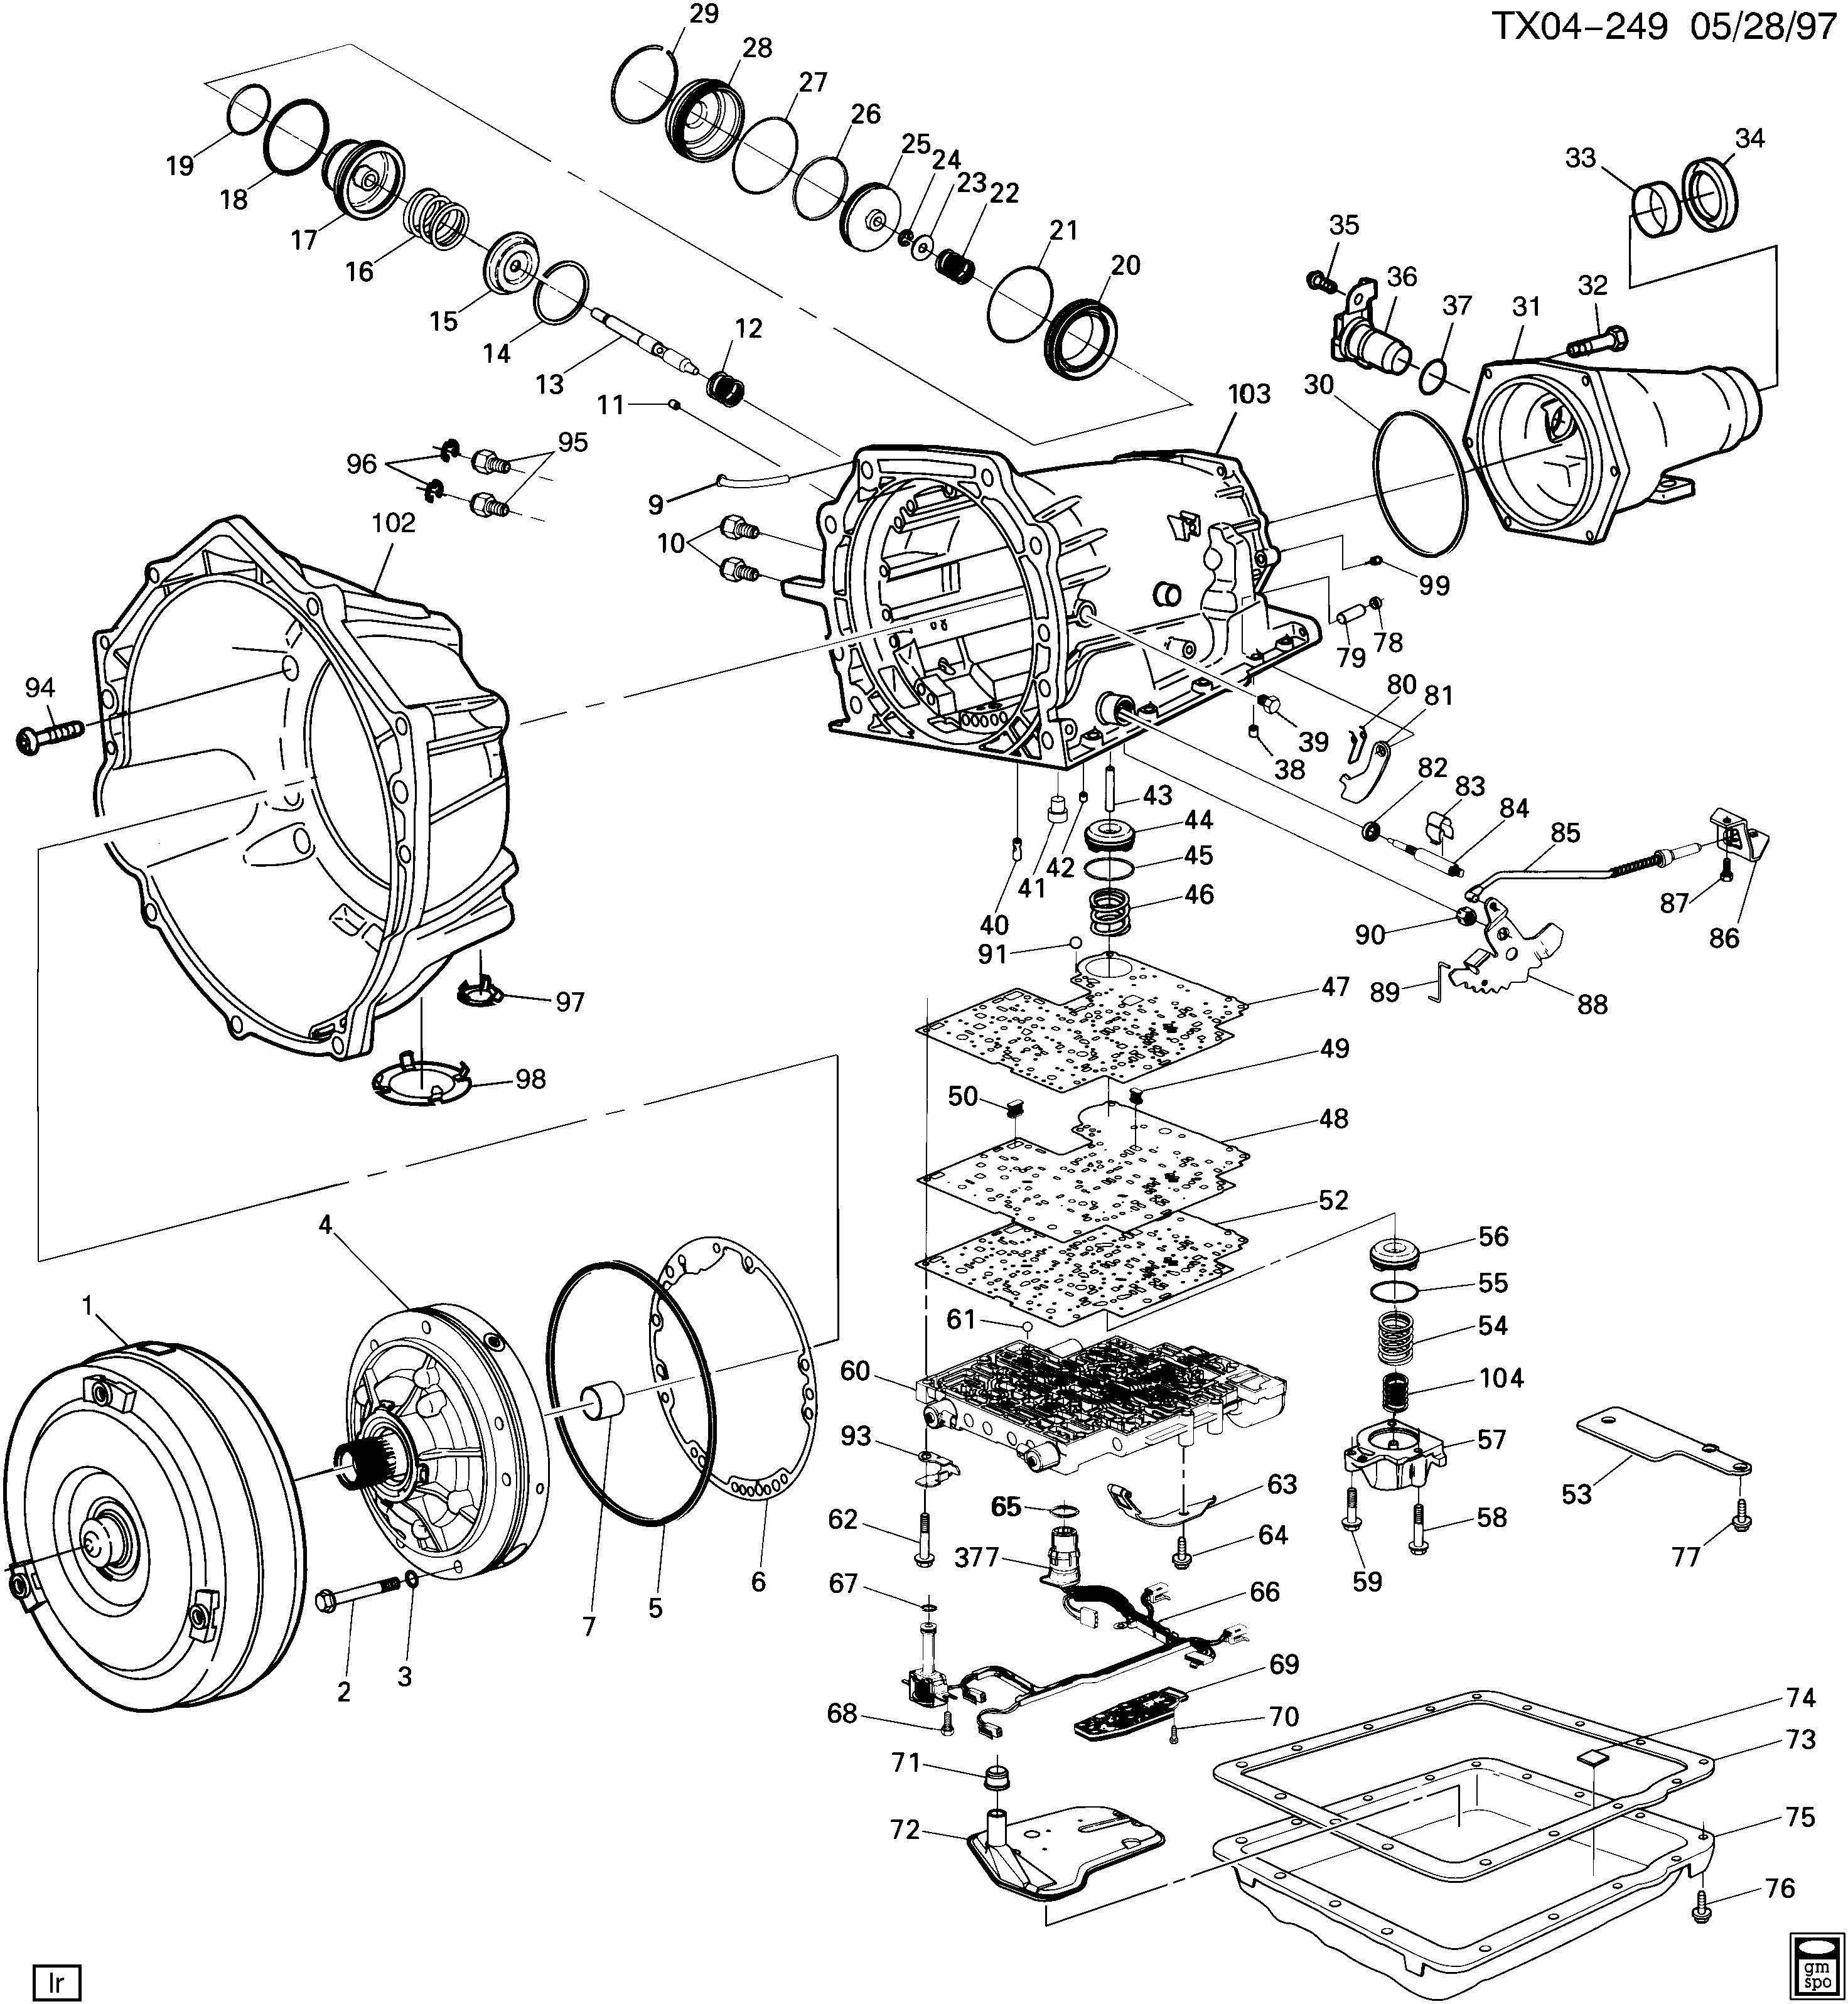 4l60e automatic transmission diagram daily update wiring 4l60e transmission wiring harness diagram 4l60e automatic transmission parts diagram #14